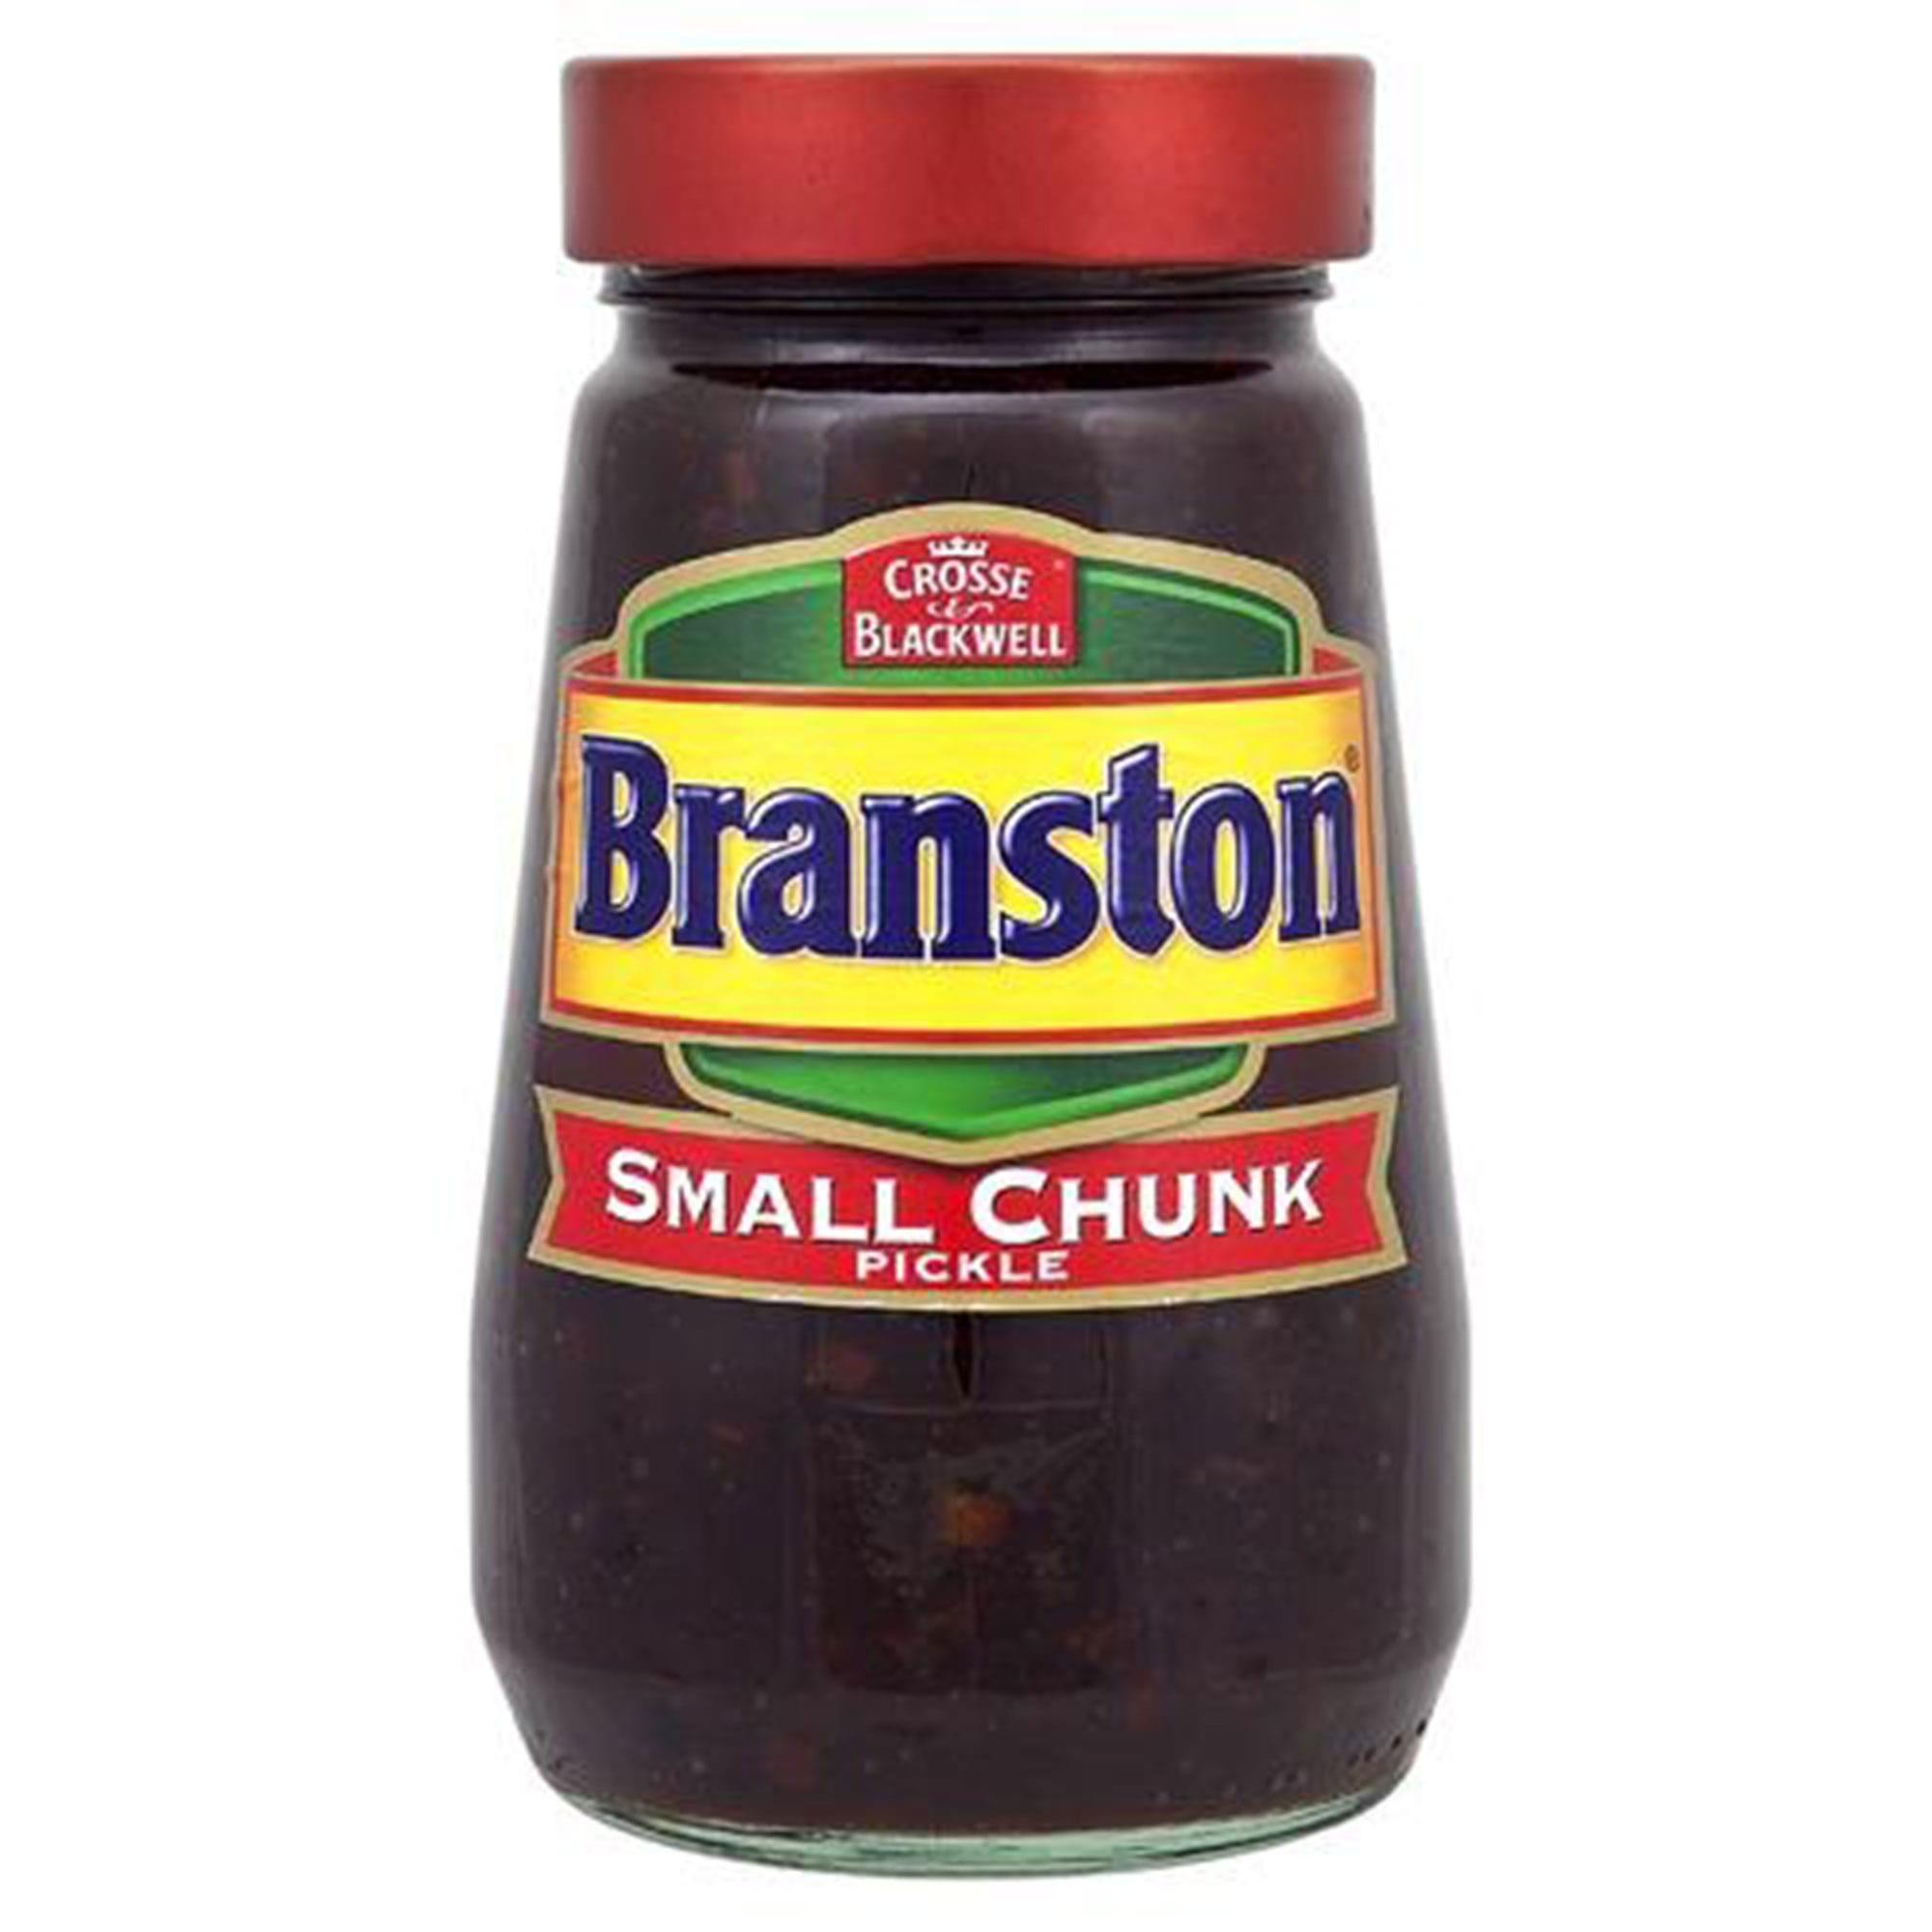 Branston Small Chunk Sandwich Pickle